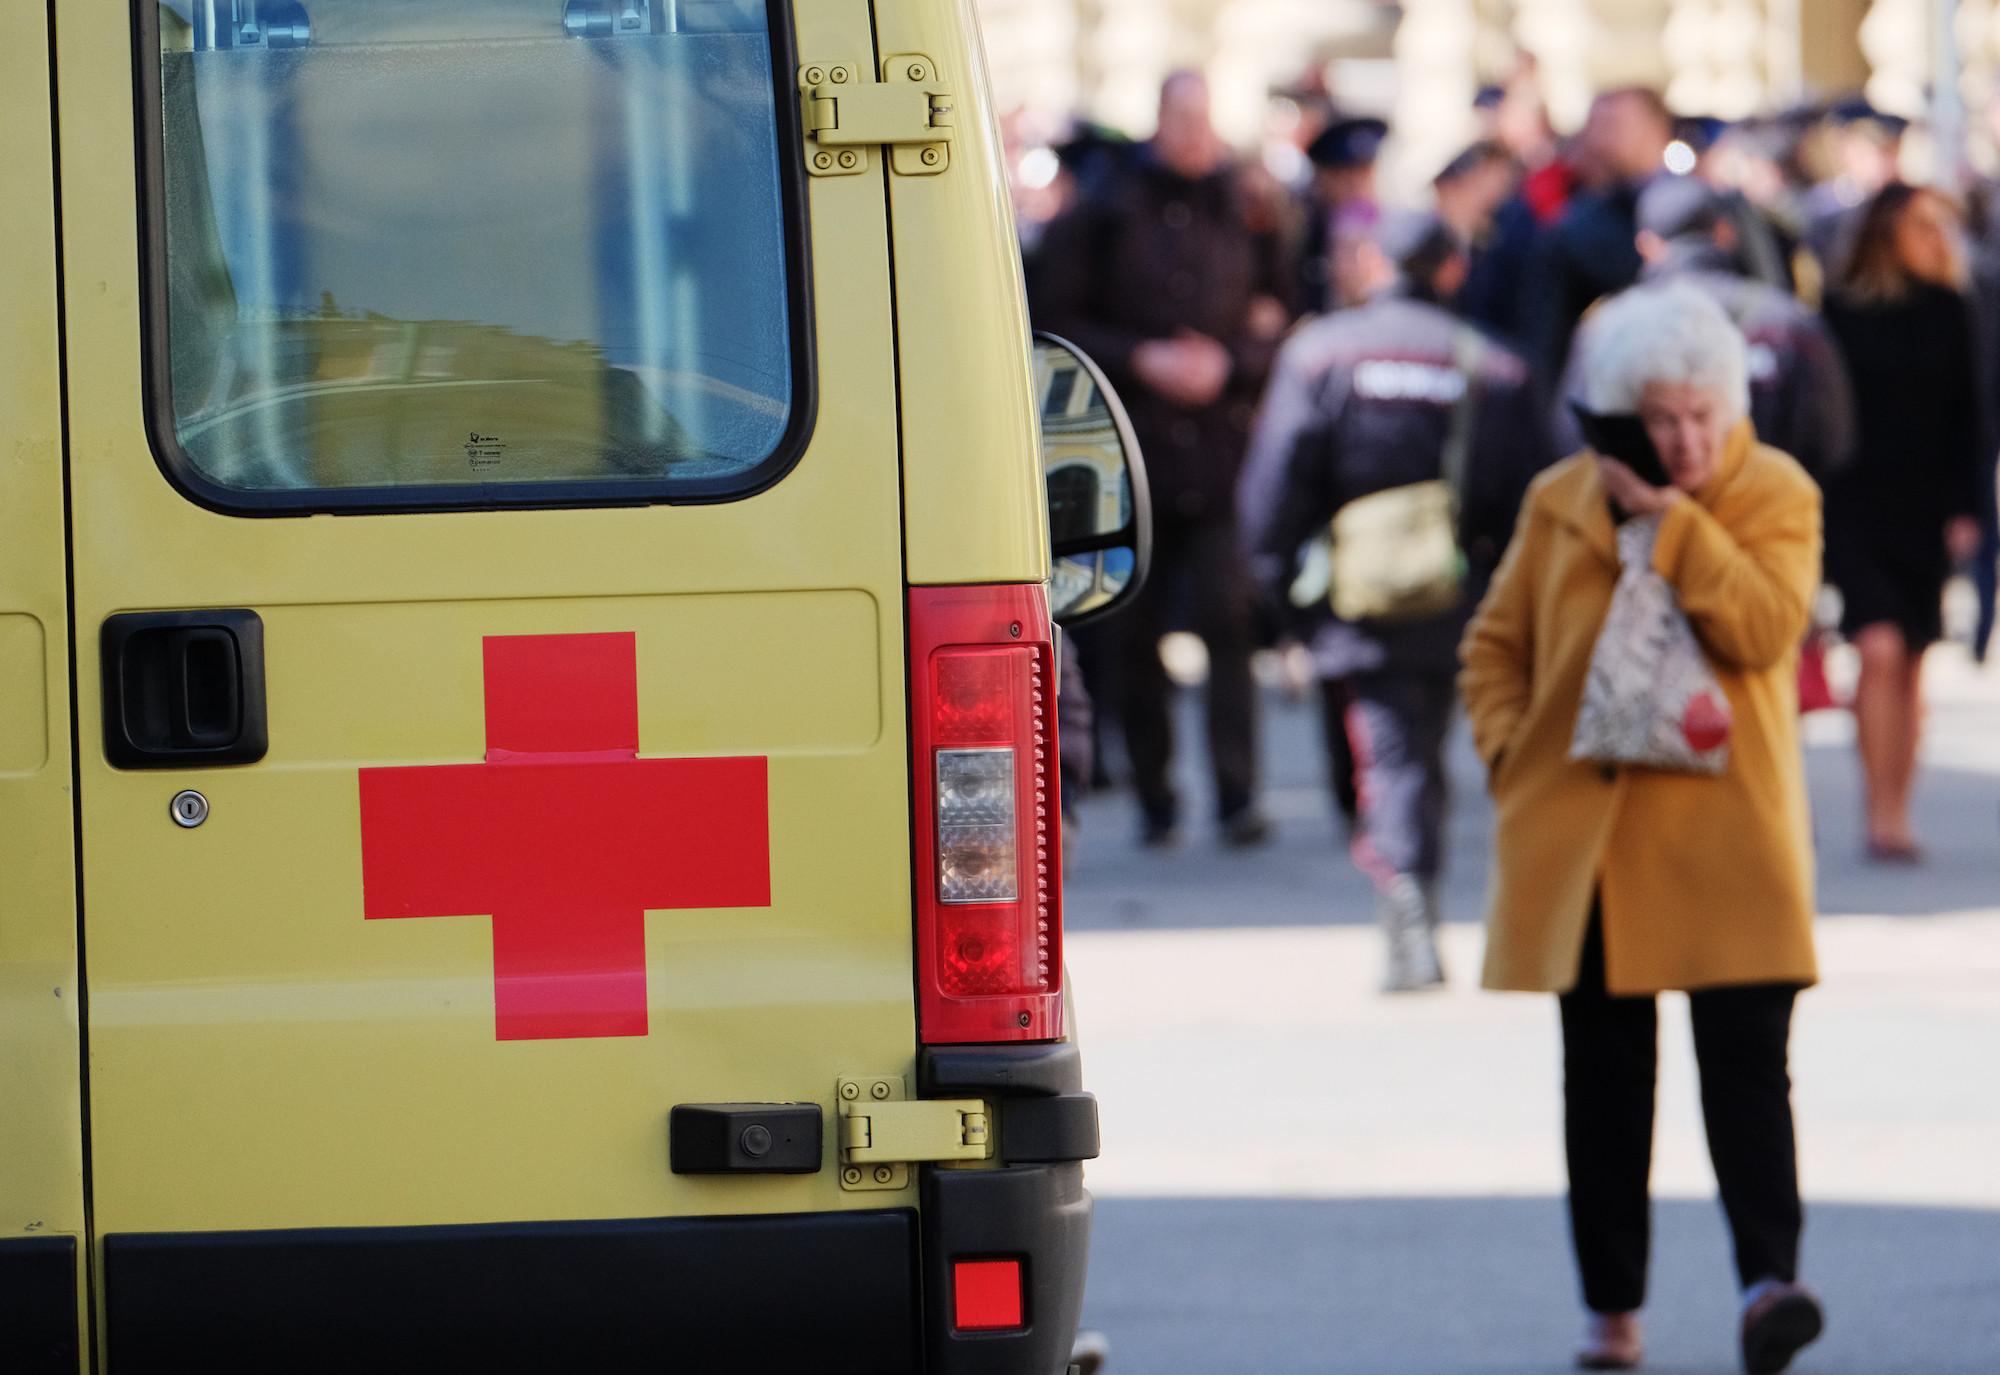 <p>Автомобиль скорой помощи. Фото: &copy; РИА Новости/Наталья Селиверстова</p>